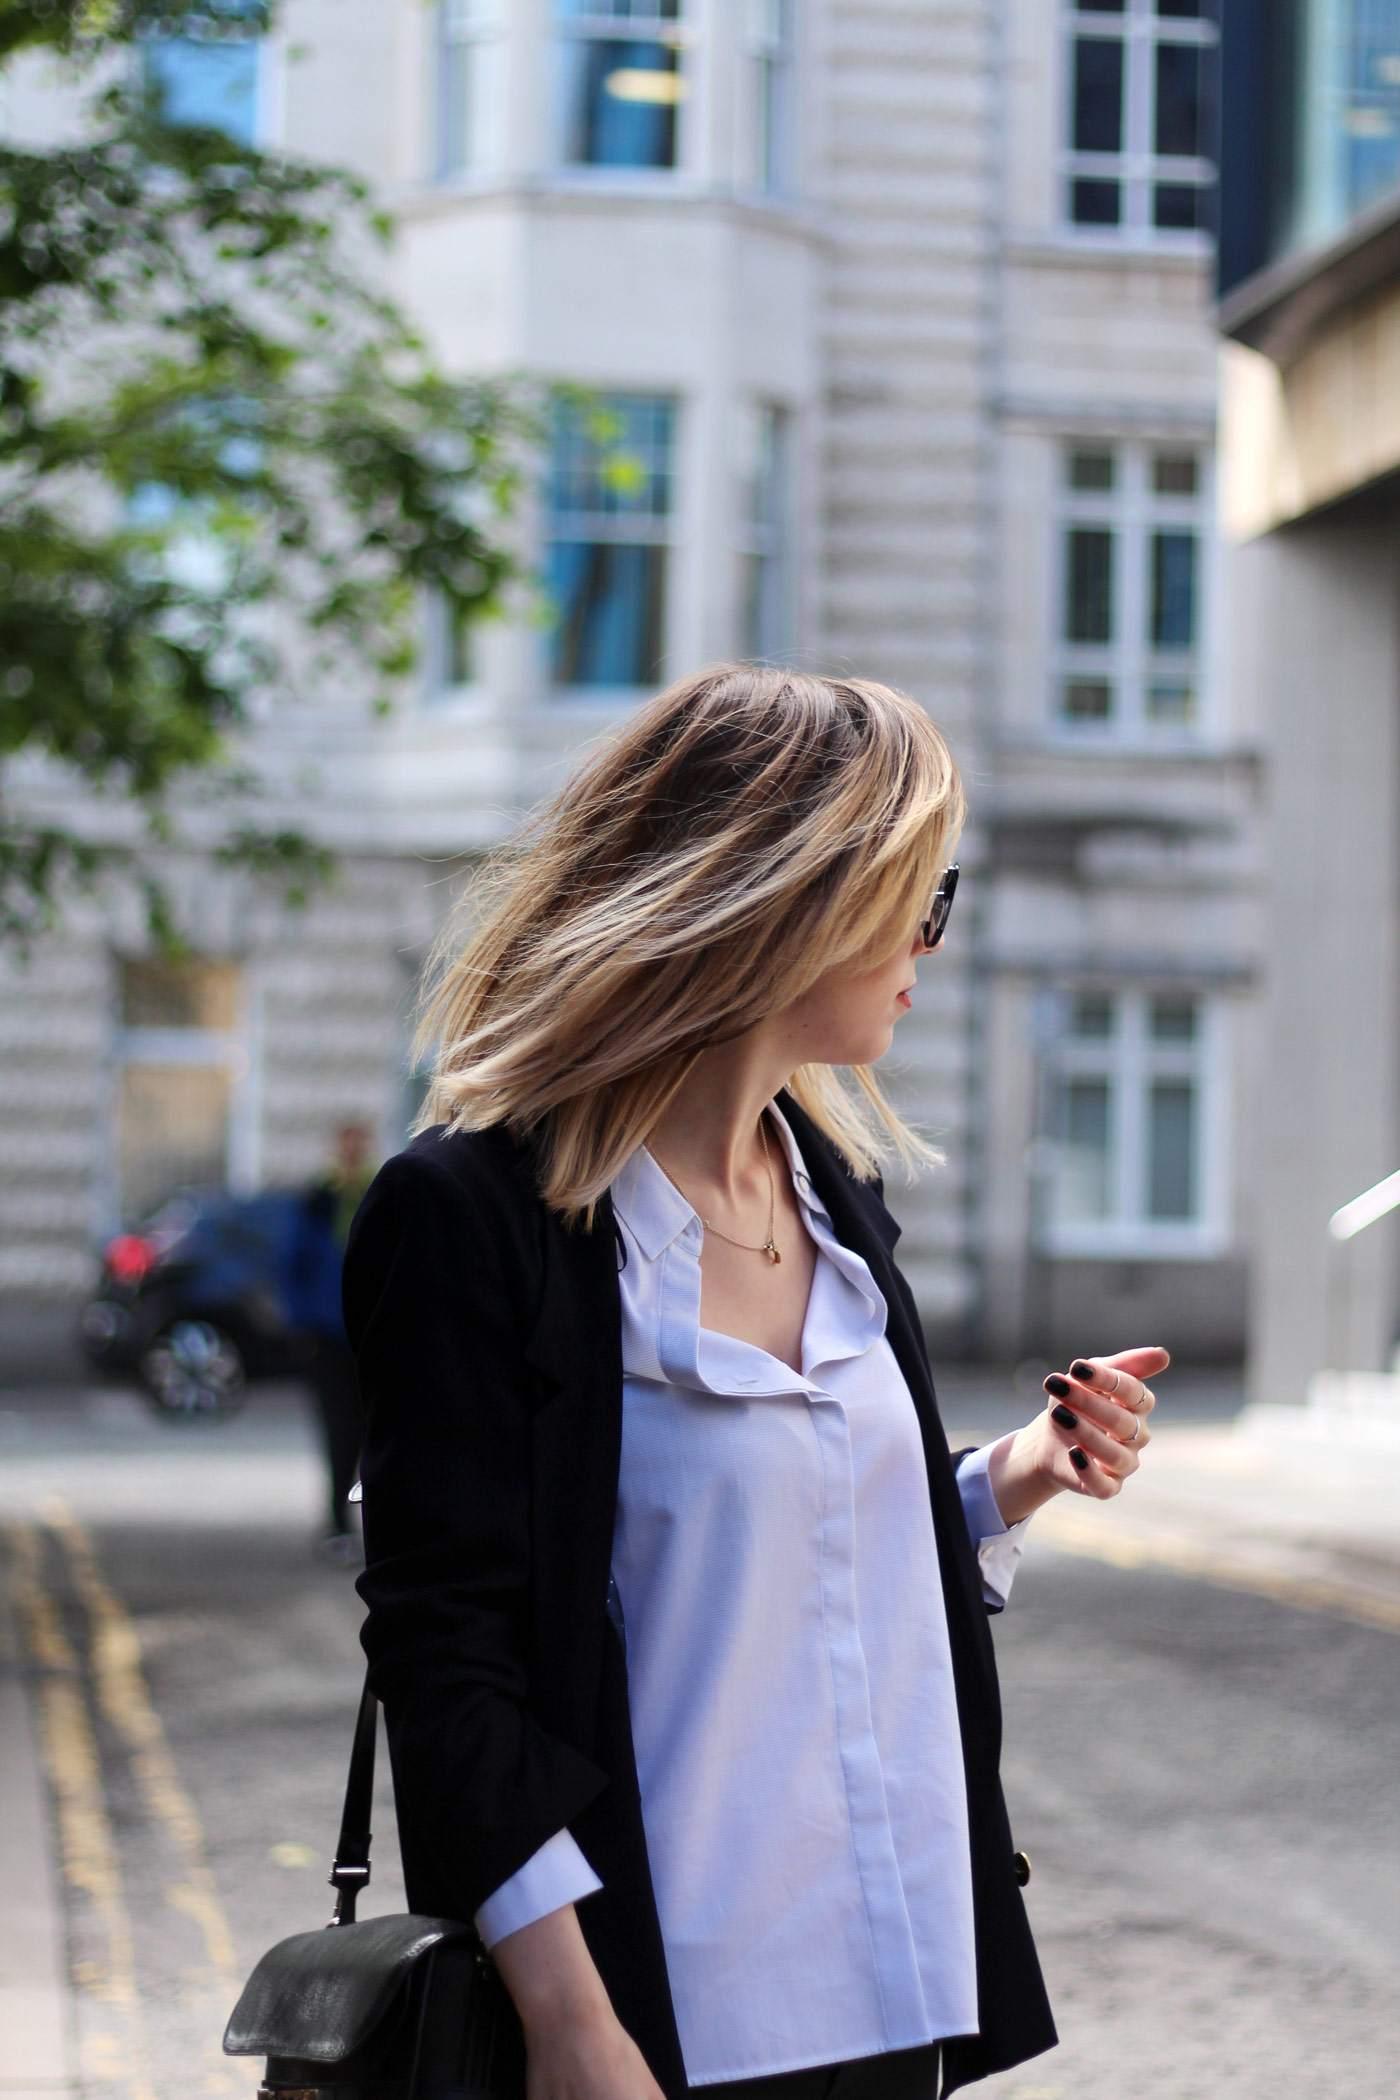 acne-jensen-boots-M&S-alexa-chung-ada-blazer-outfit-1